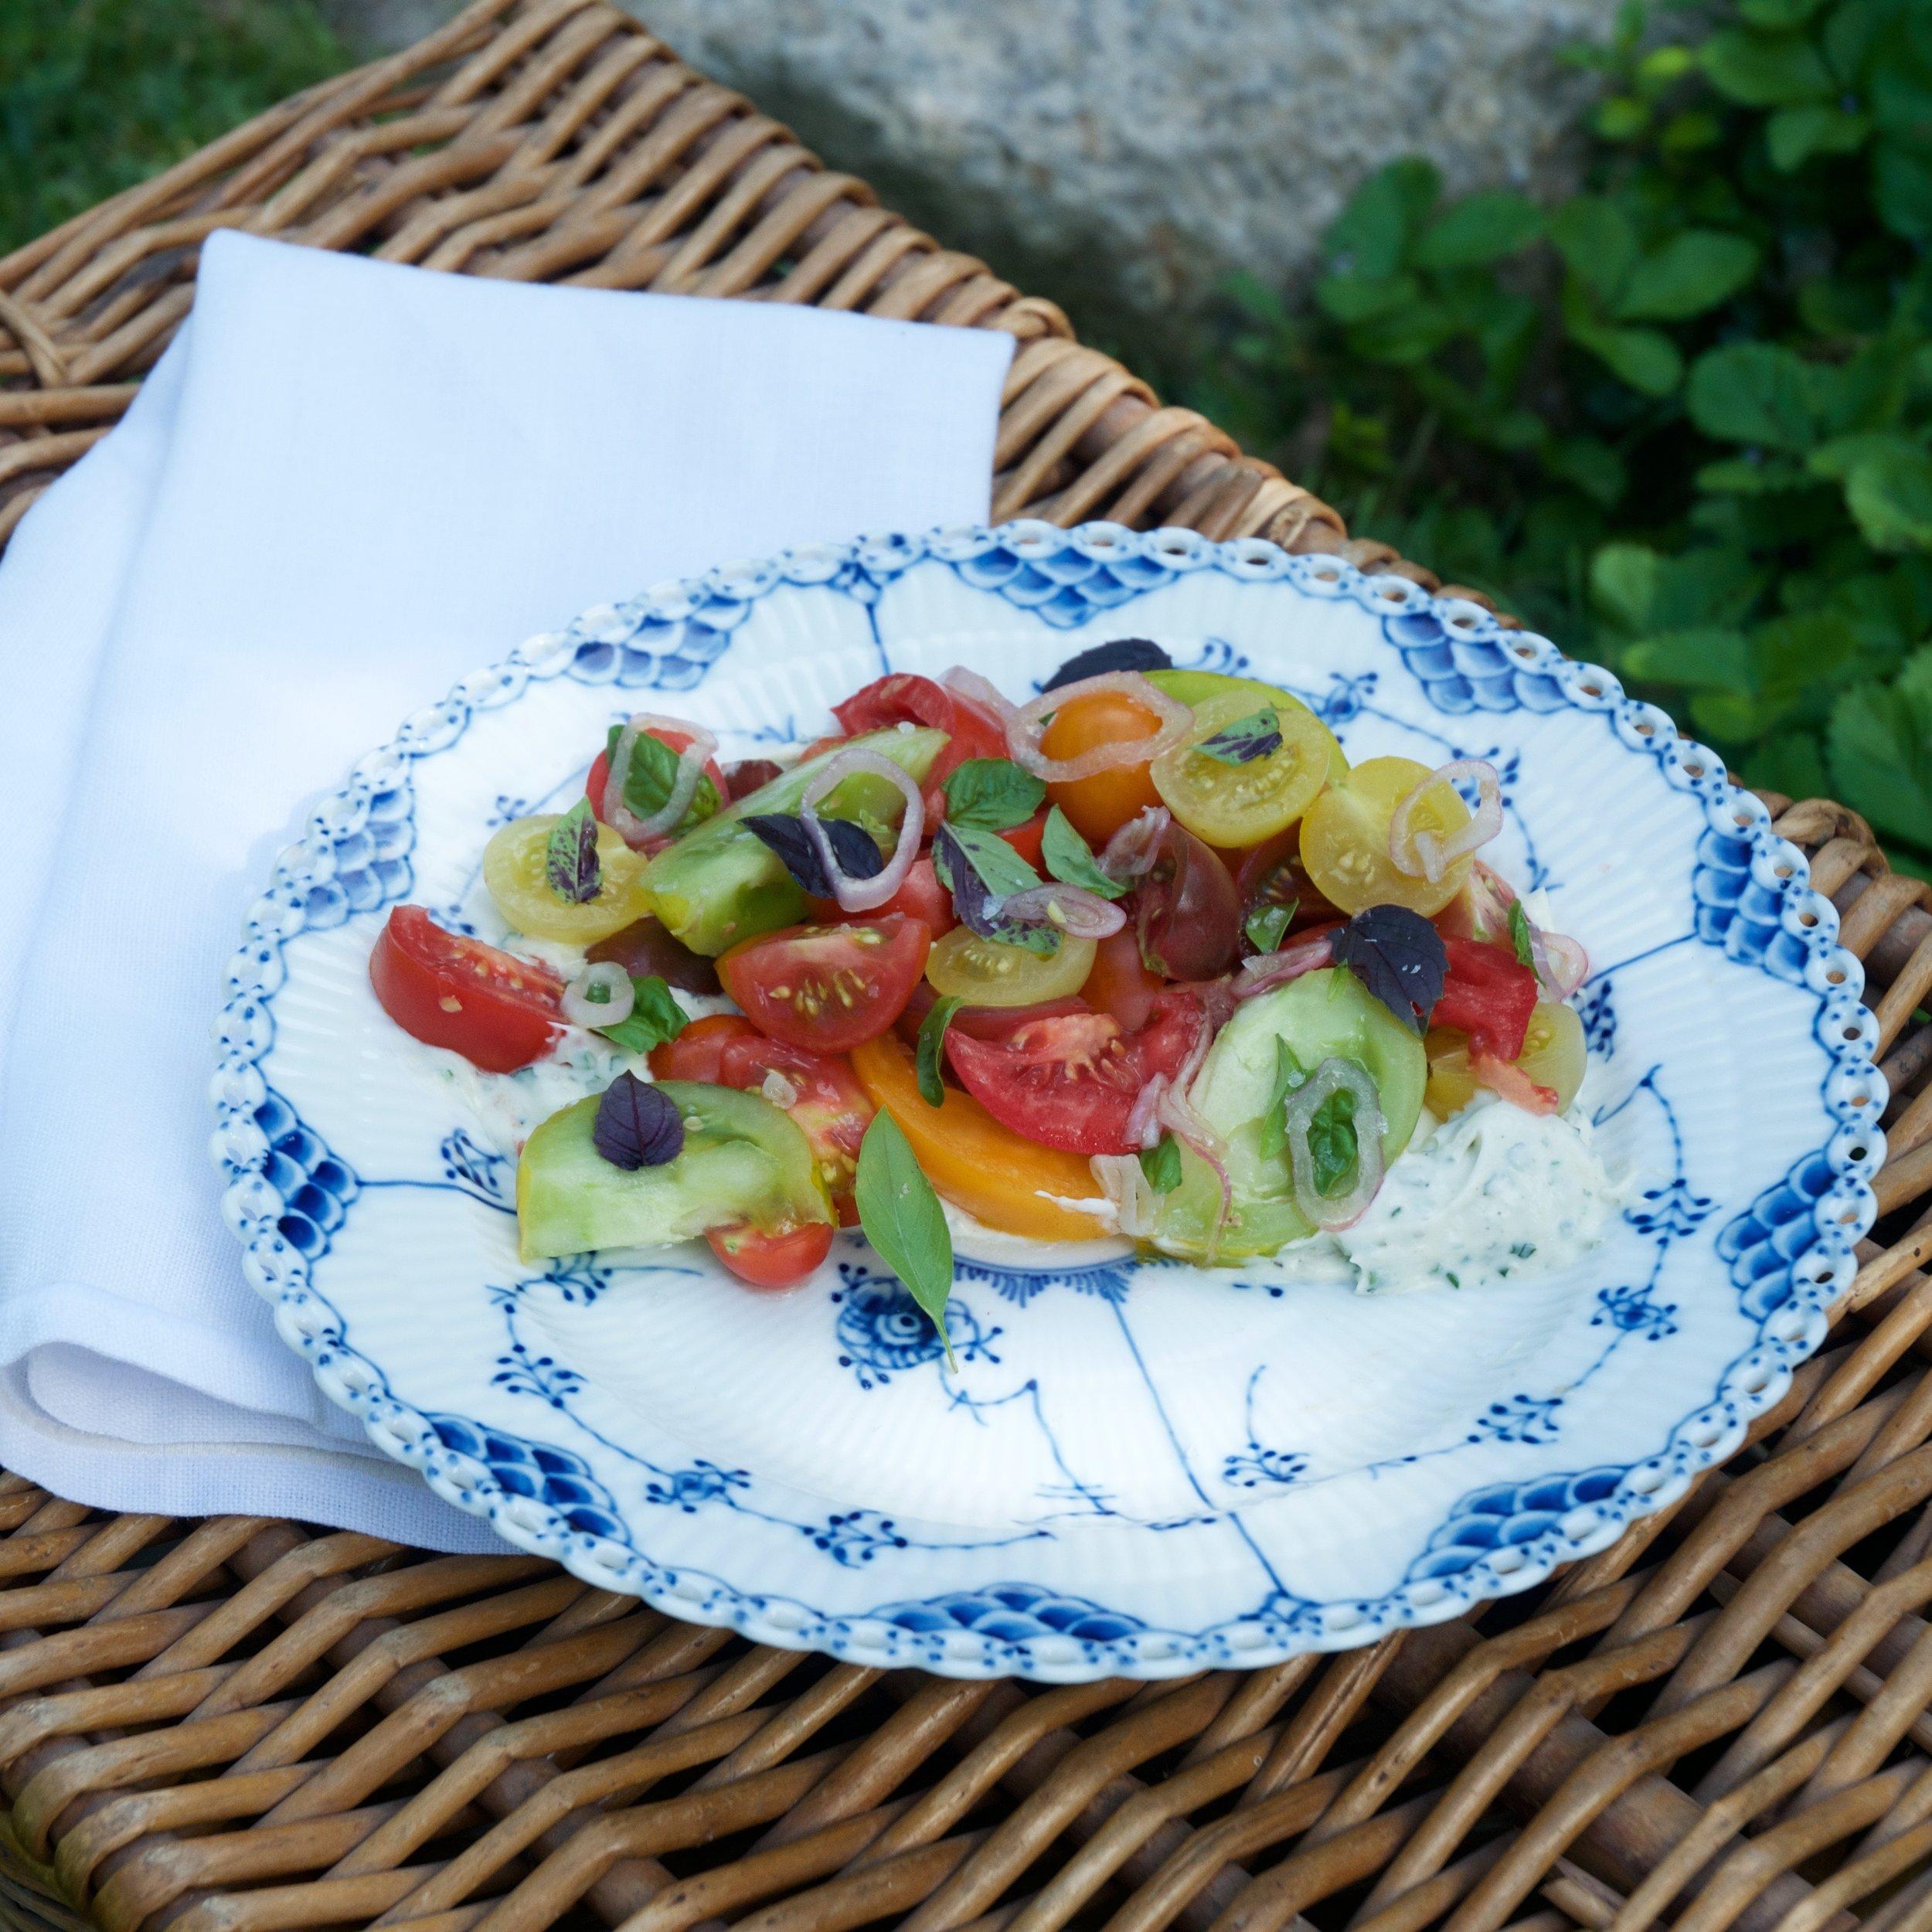 NOPI TOMATOES WITH WASABI MASCARPONE AND PINE NUTS